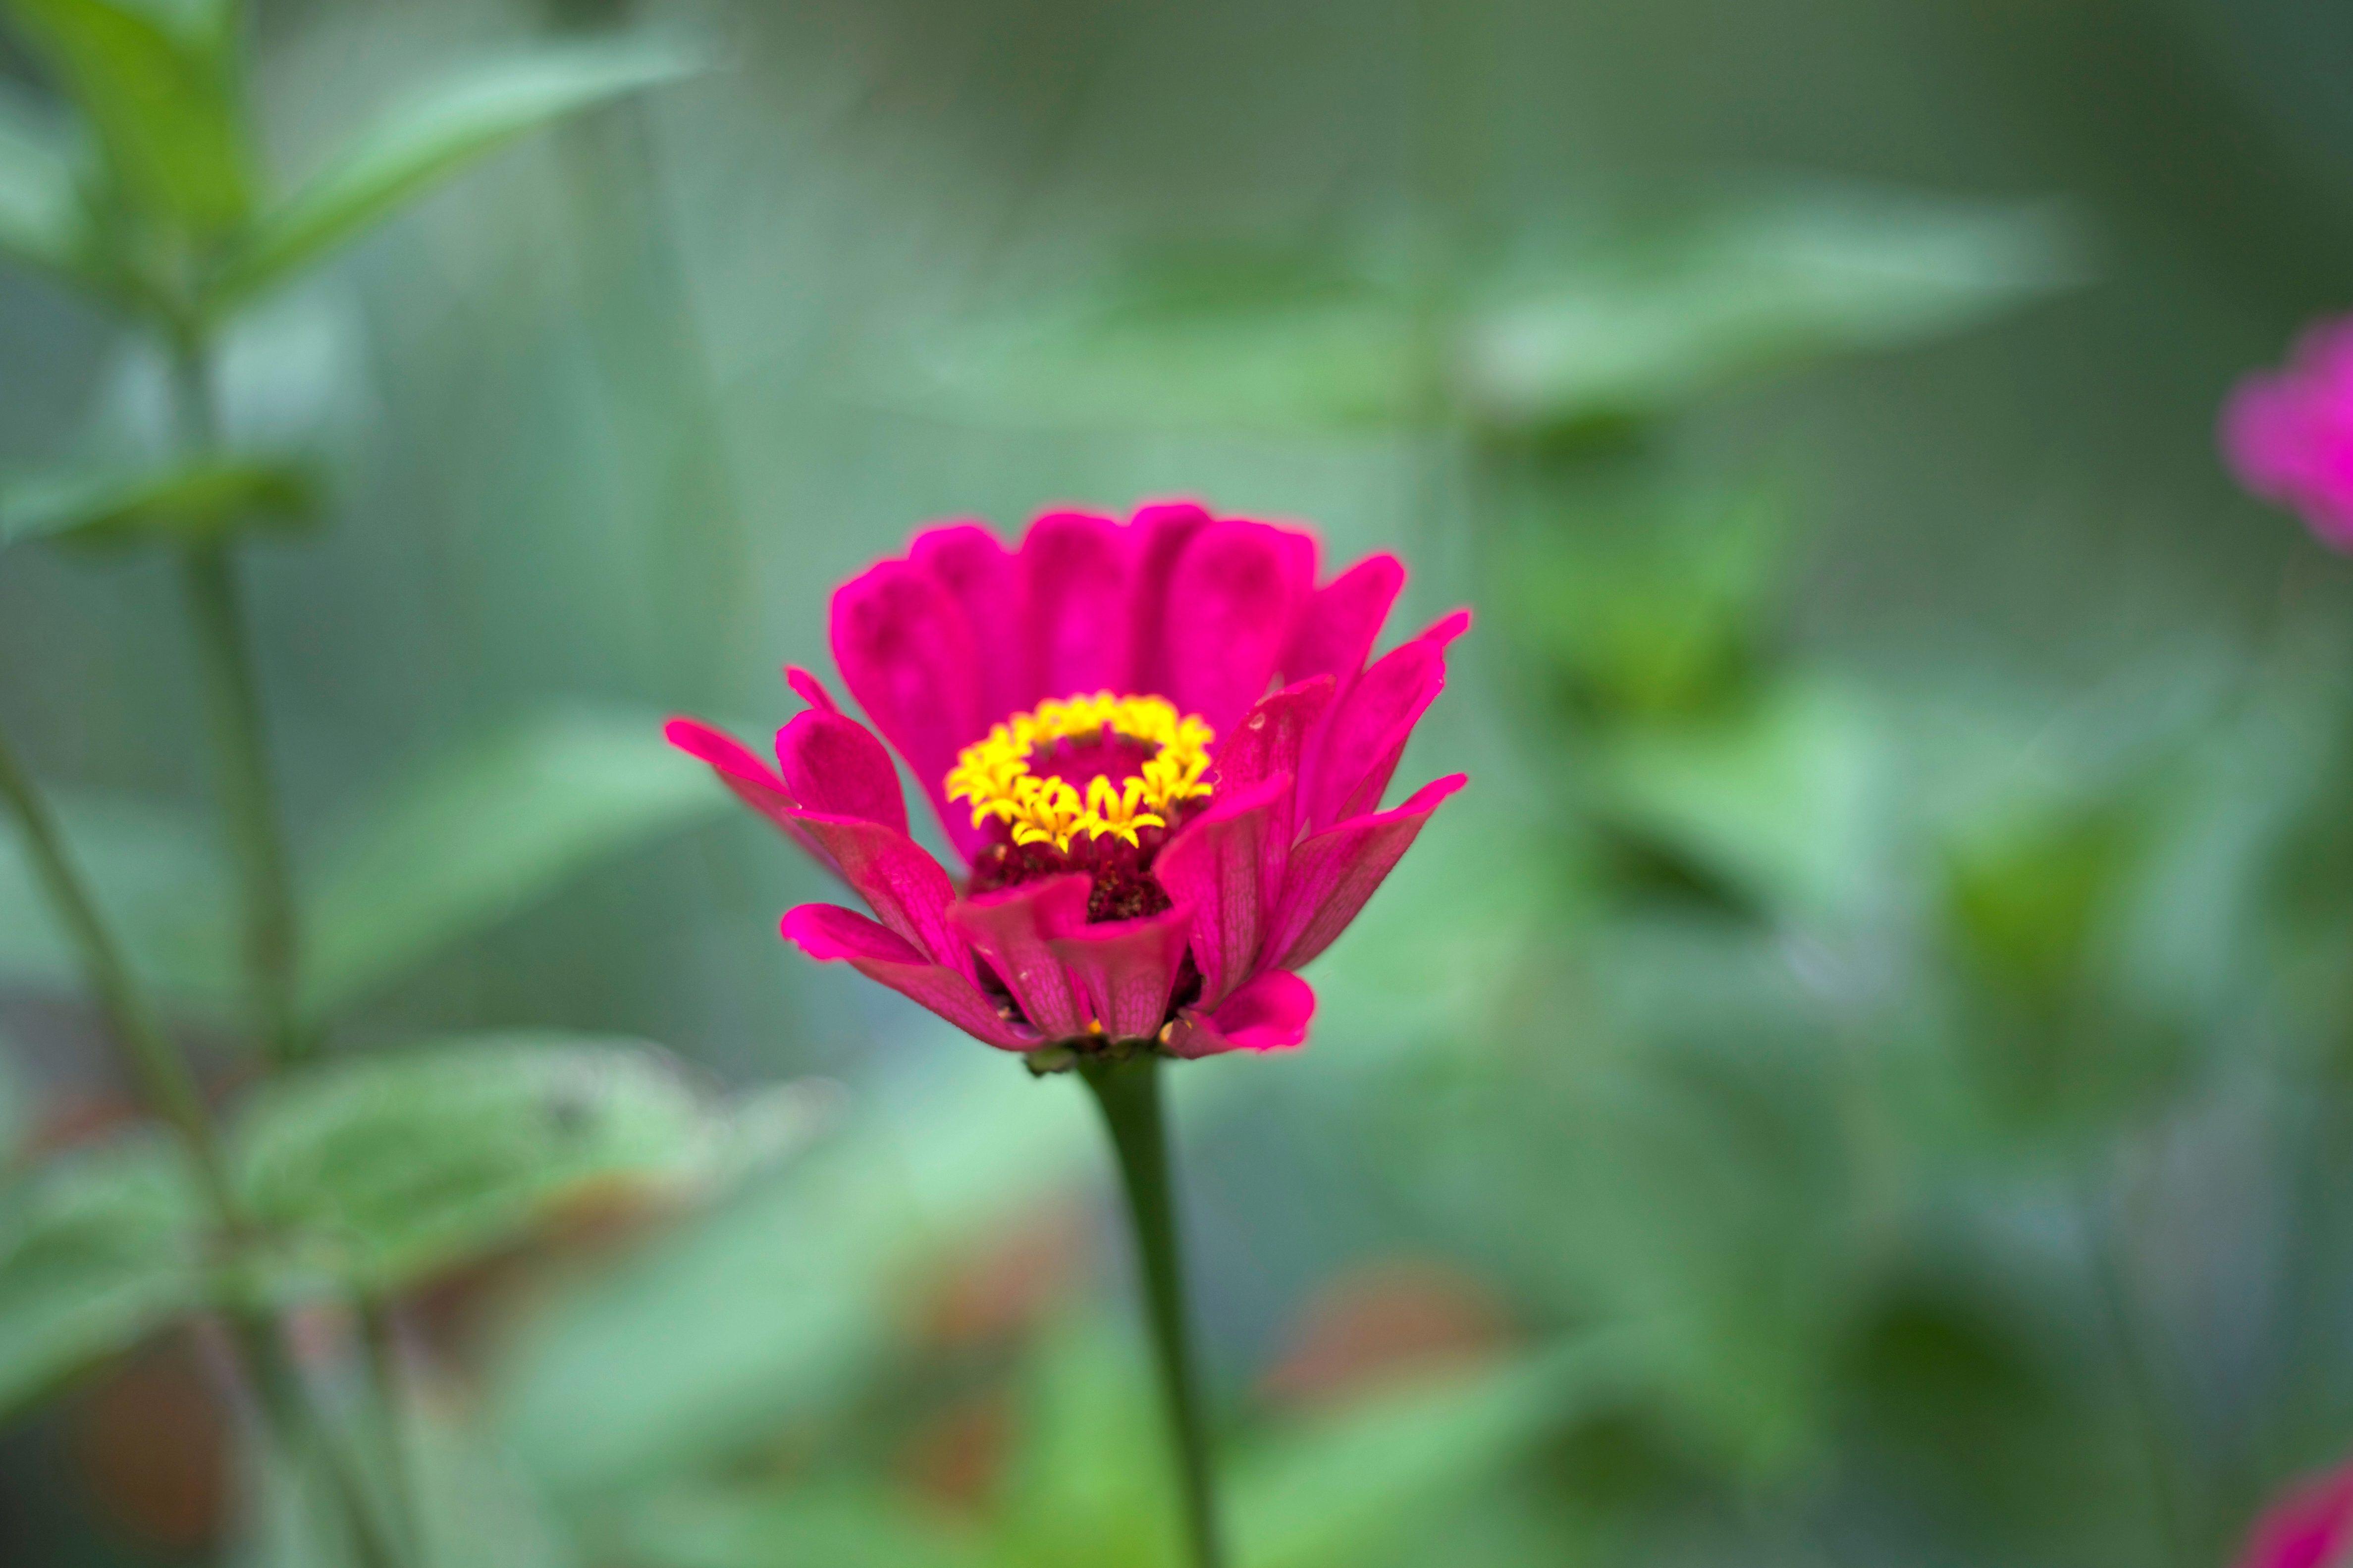 Free Picture Yellow Flower Nectar Pinkish Flower